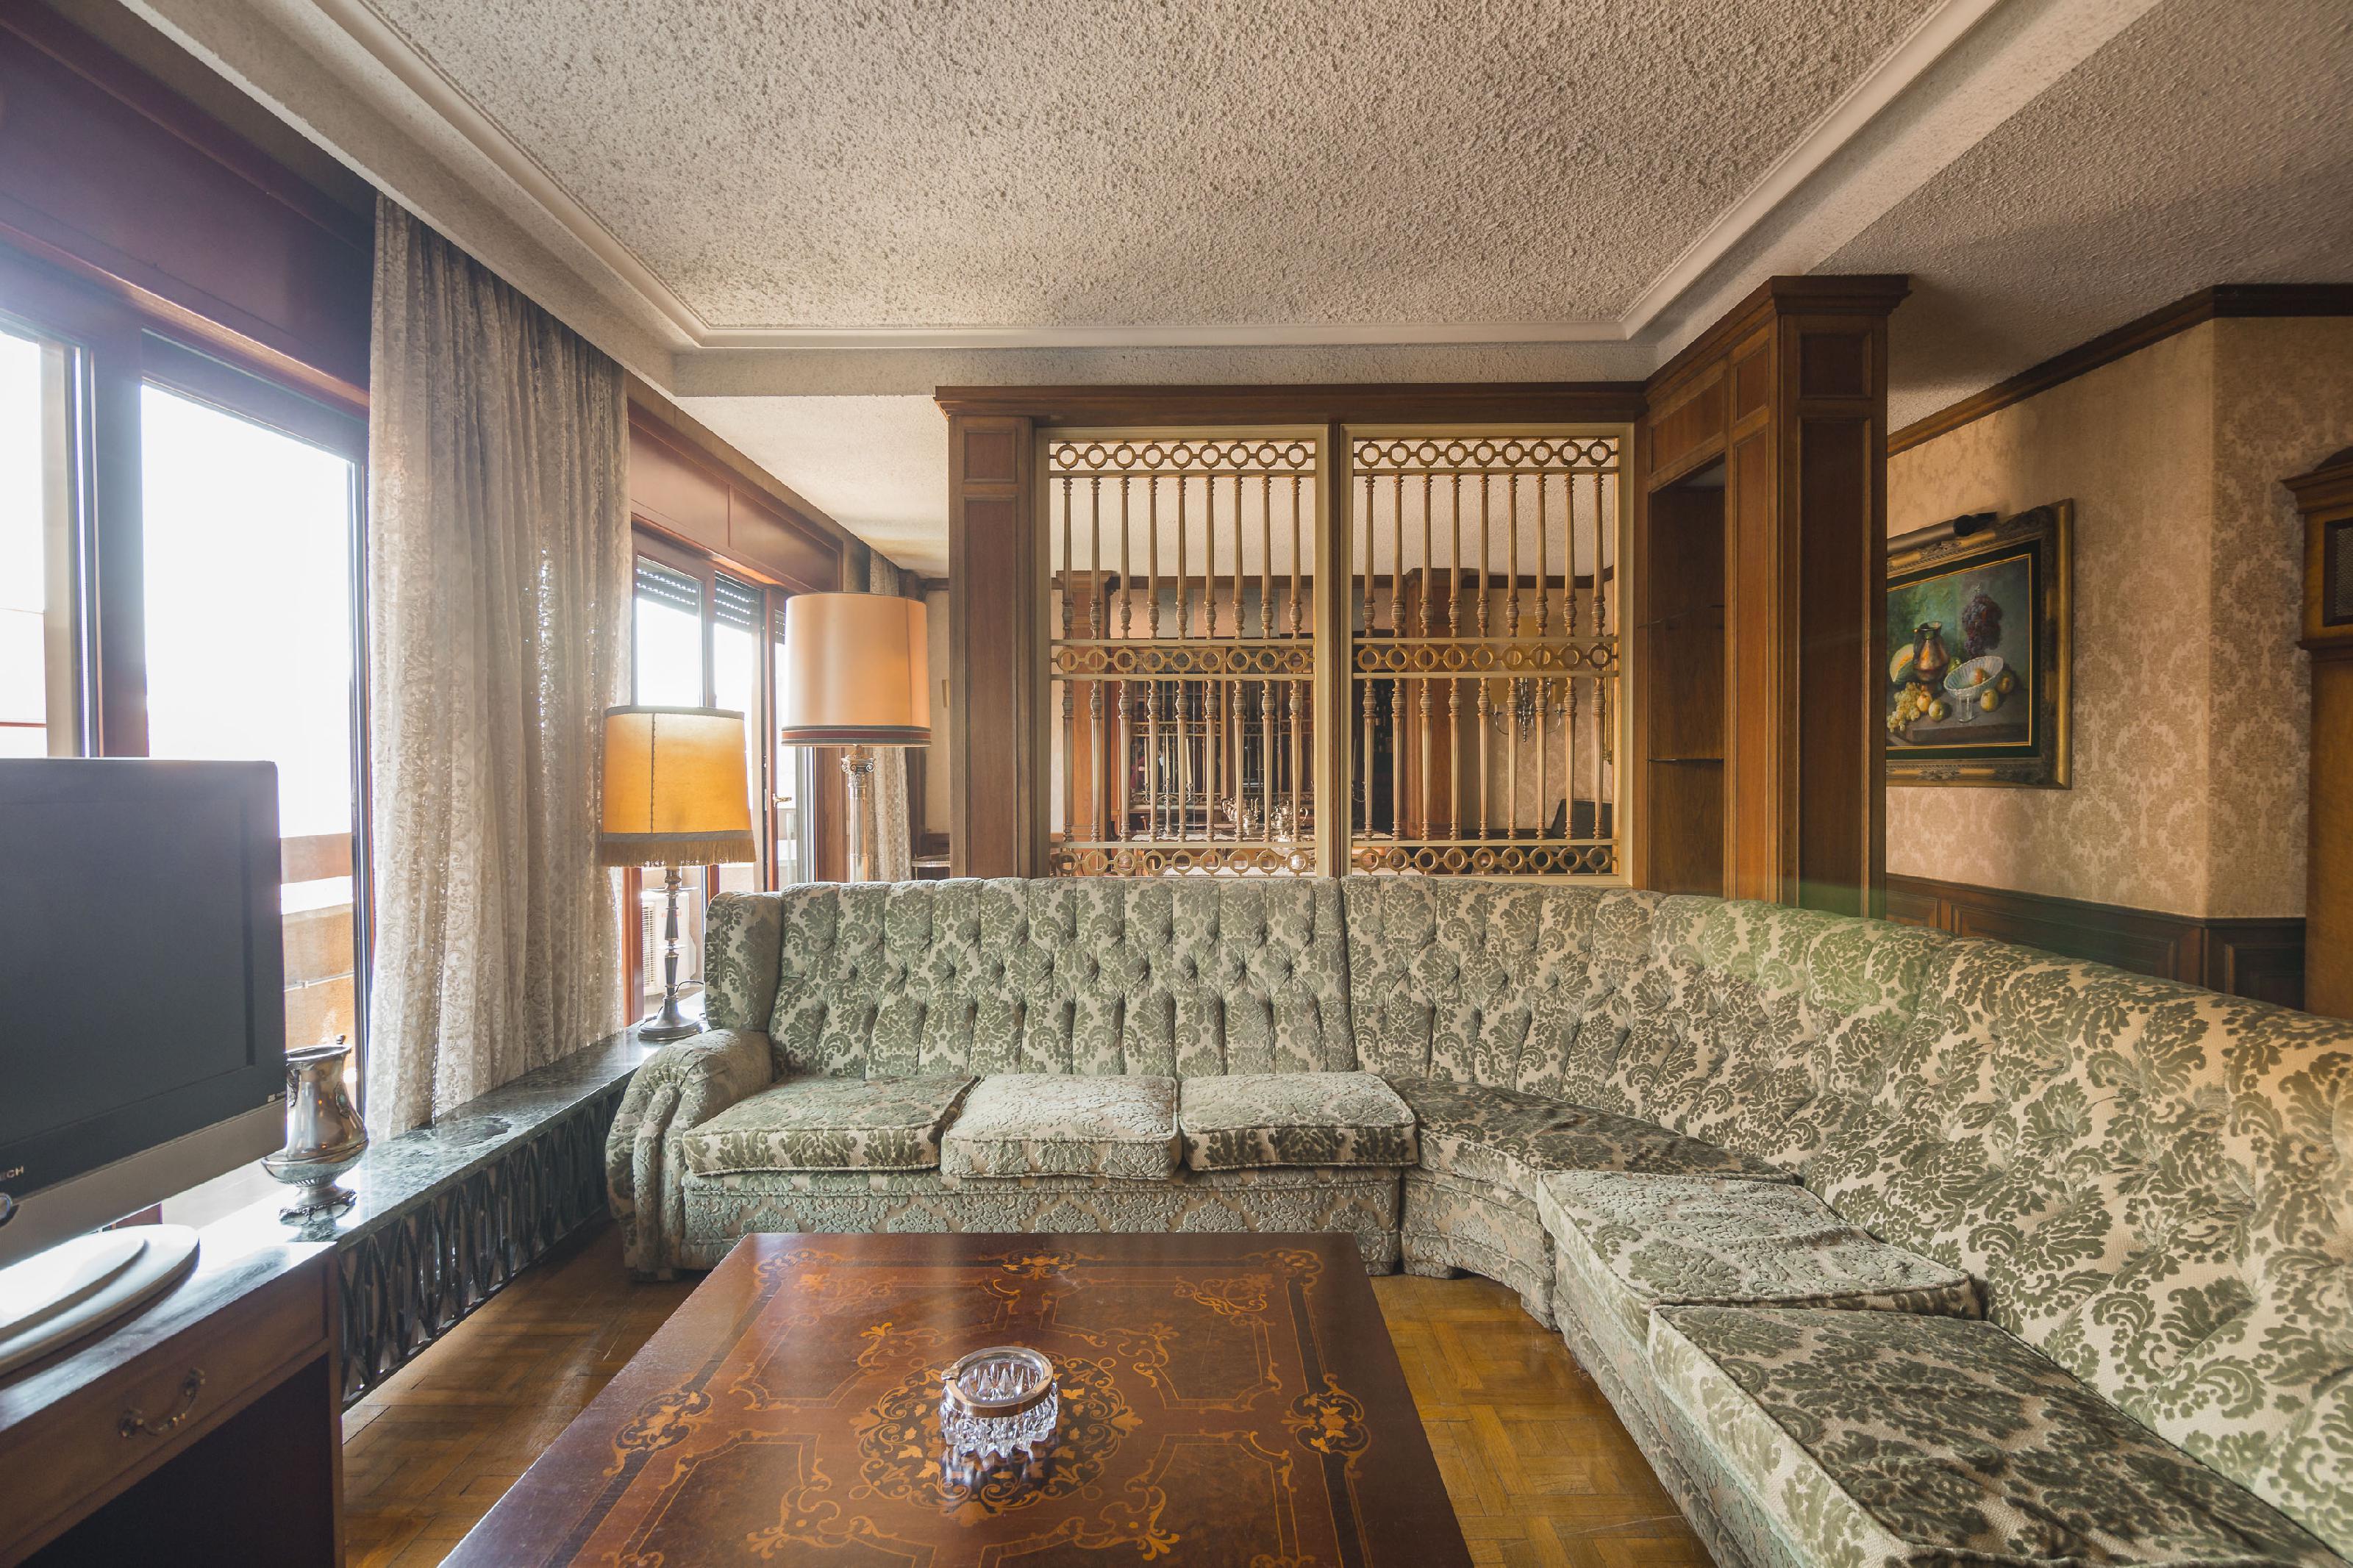 249856 Flat for sale in Sarrià-Sant Gervasi, Sant Gervasi-Galvany 9